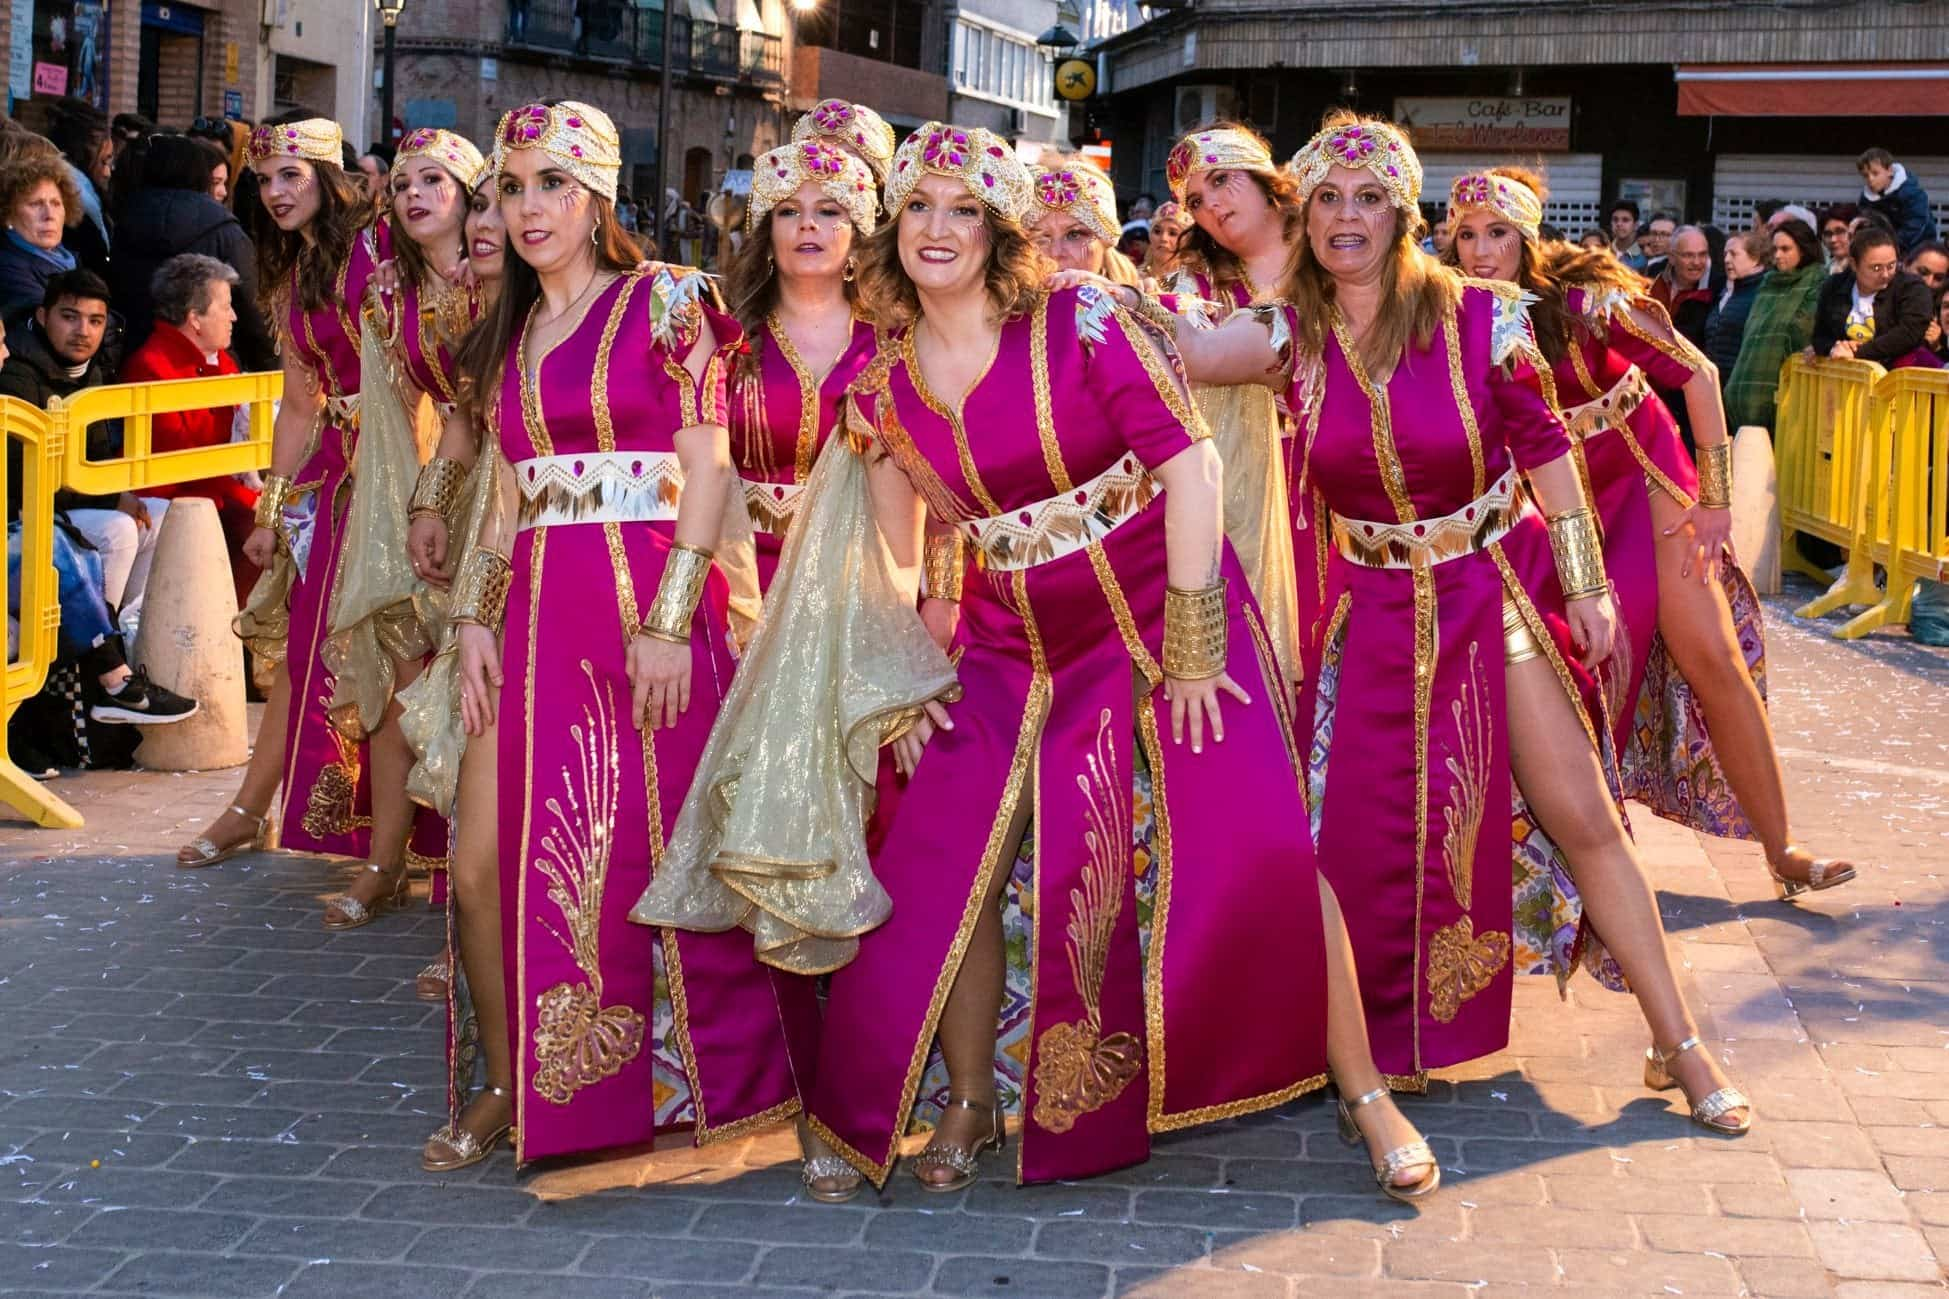 Carnaval de herencia 2020 ofertorio 57 - Selección de fotografías del Ofertorio del Carnaval de Herencia